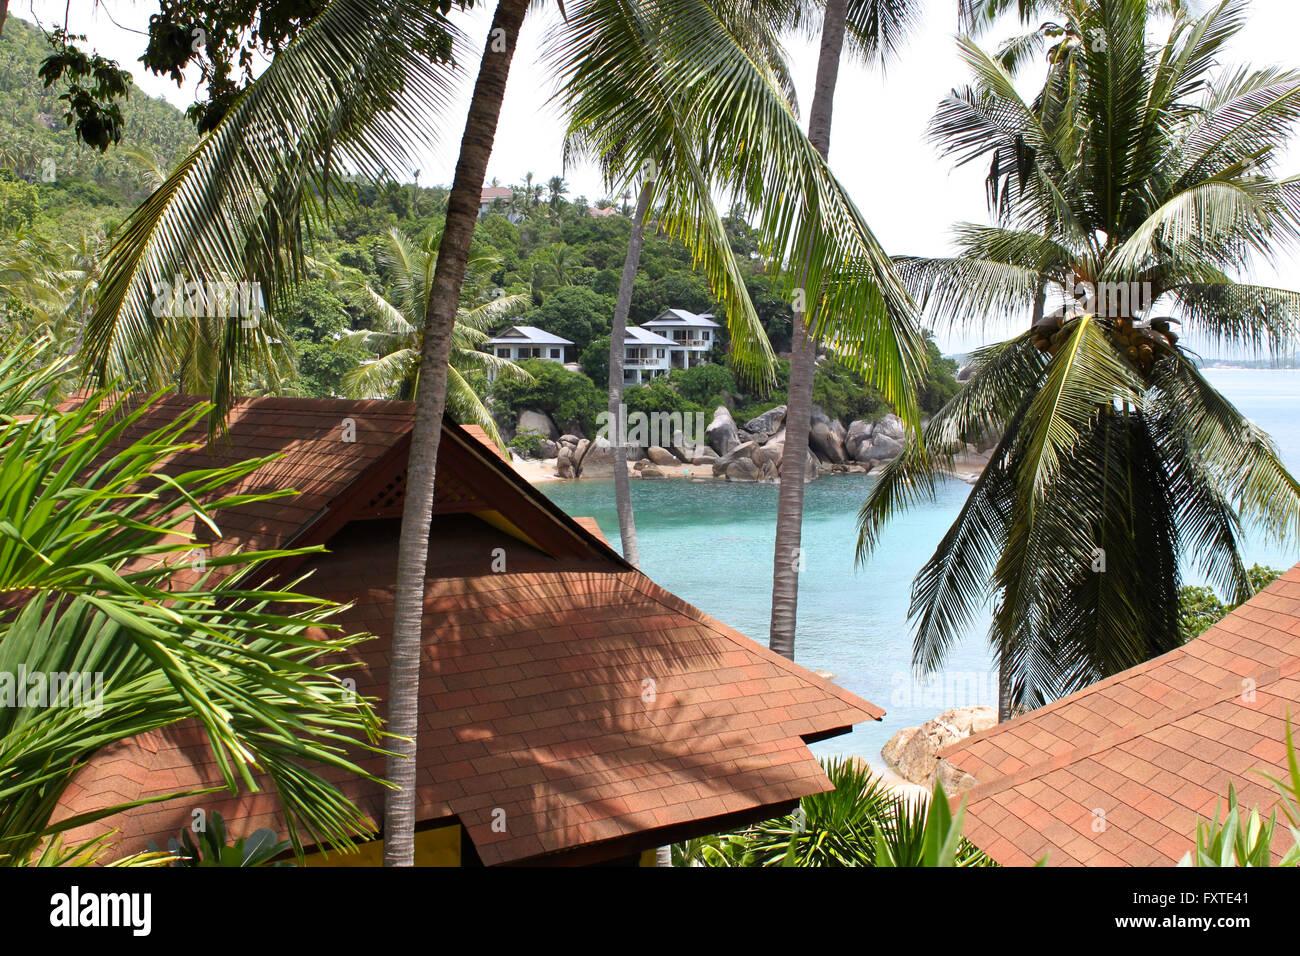 Tropical landscape on the island of Koh Samui, Thailand, Southeast Asia - Stock Image